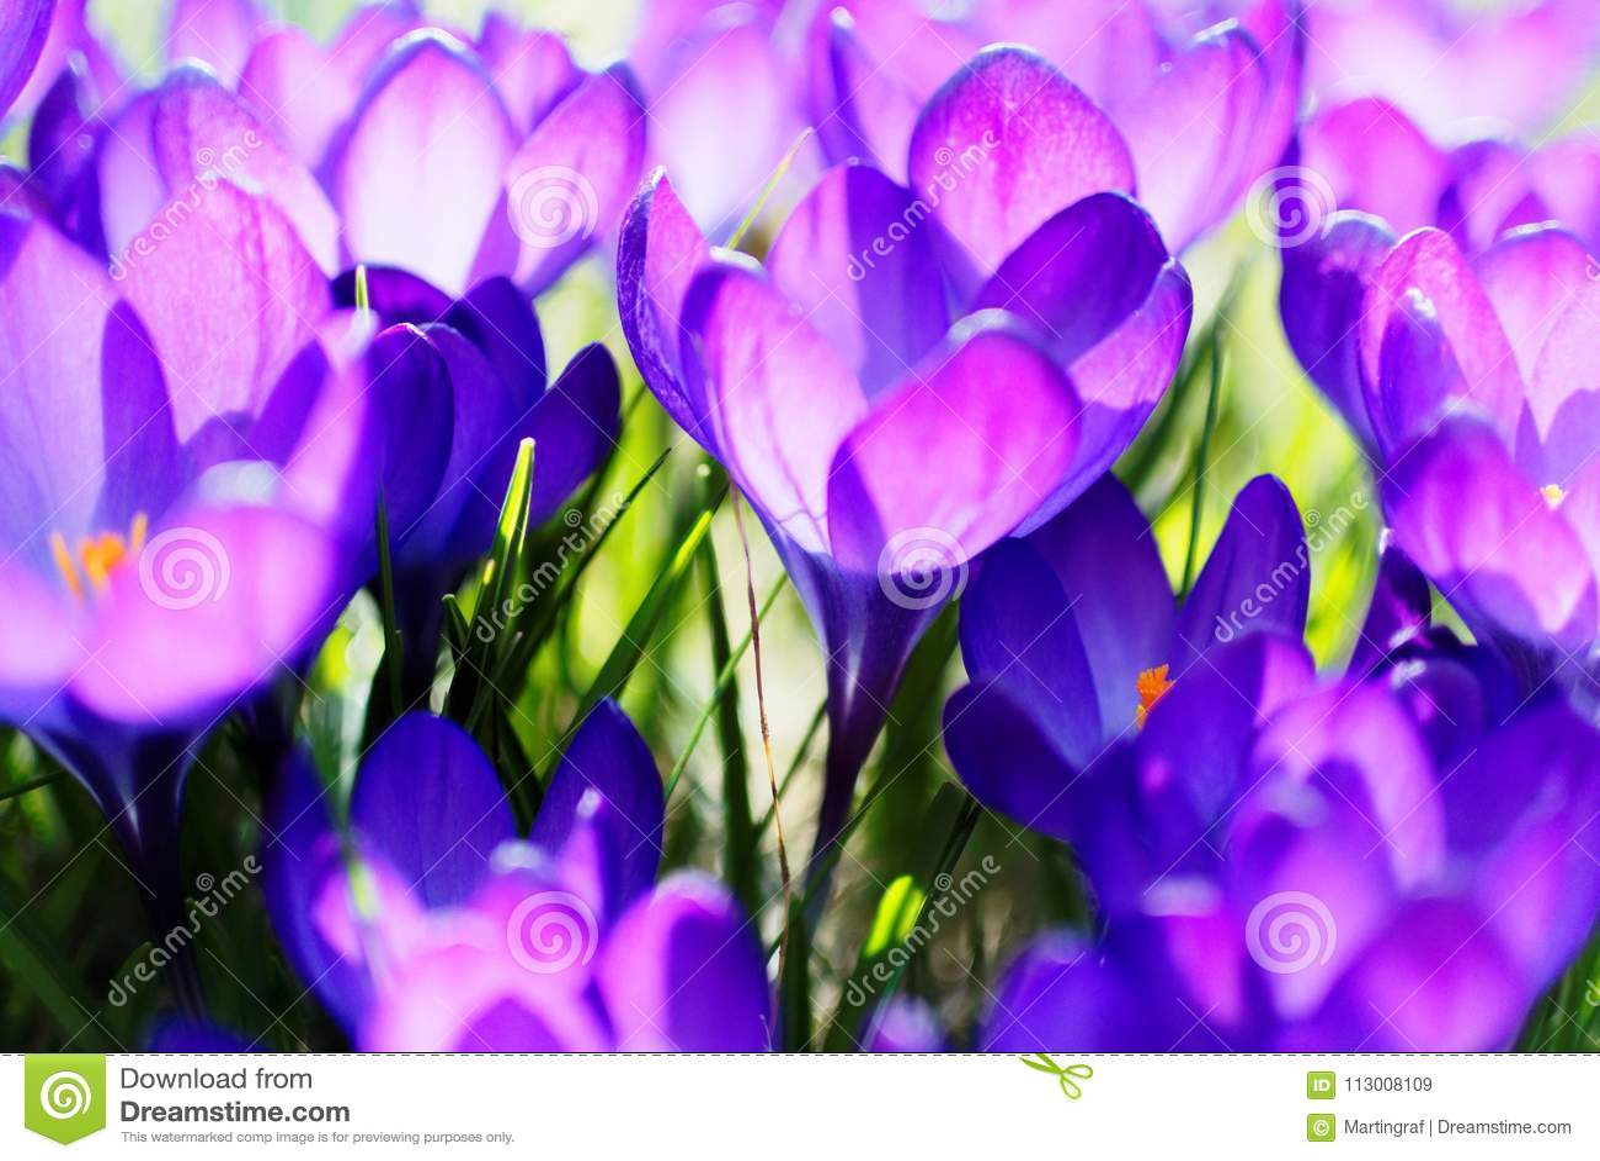 Violet Crocus bloom bright in sunlight